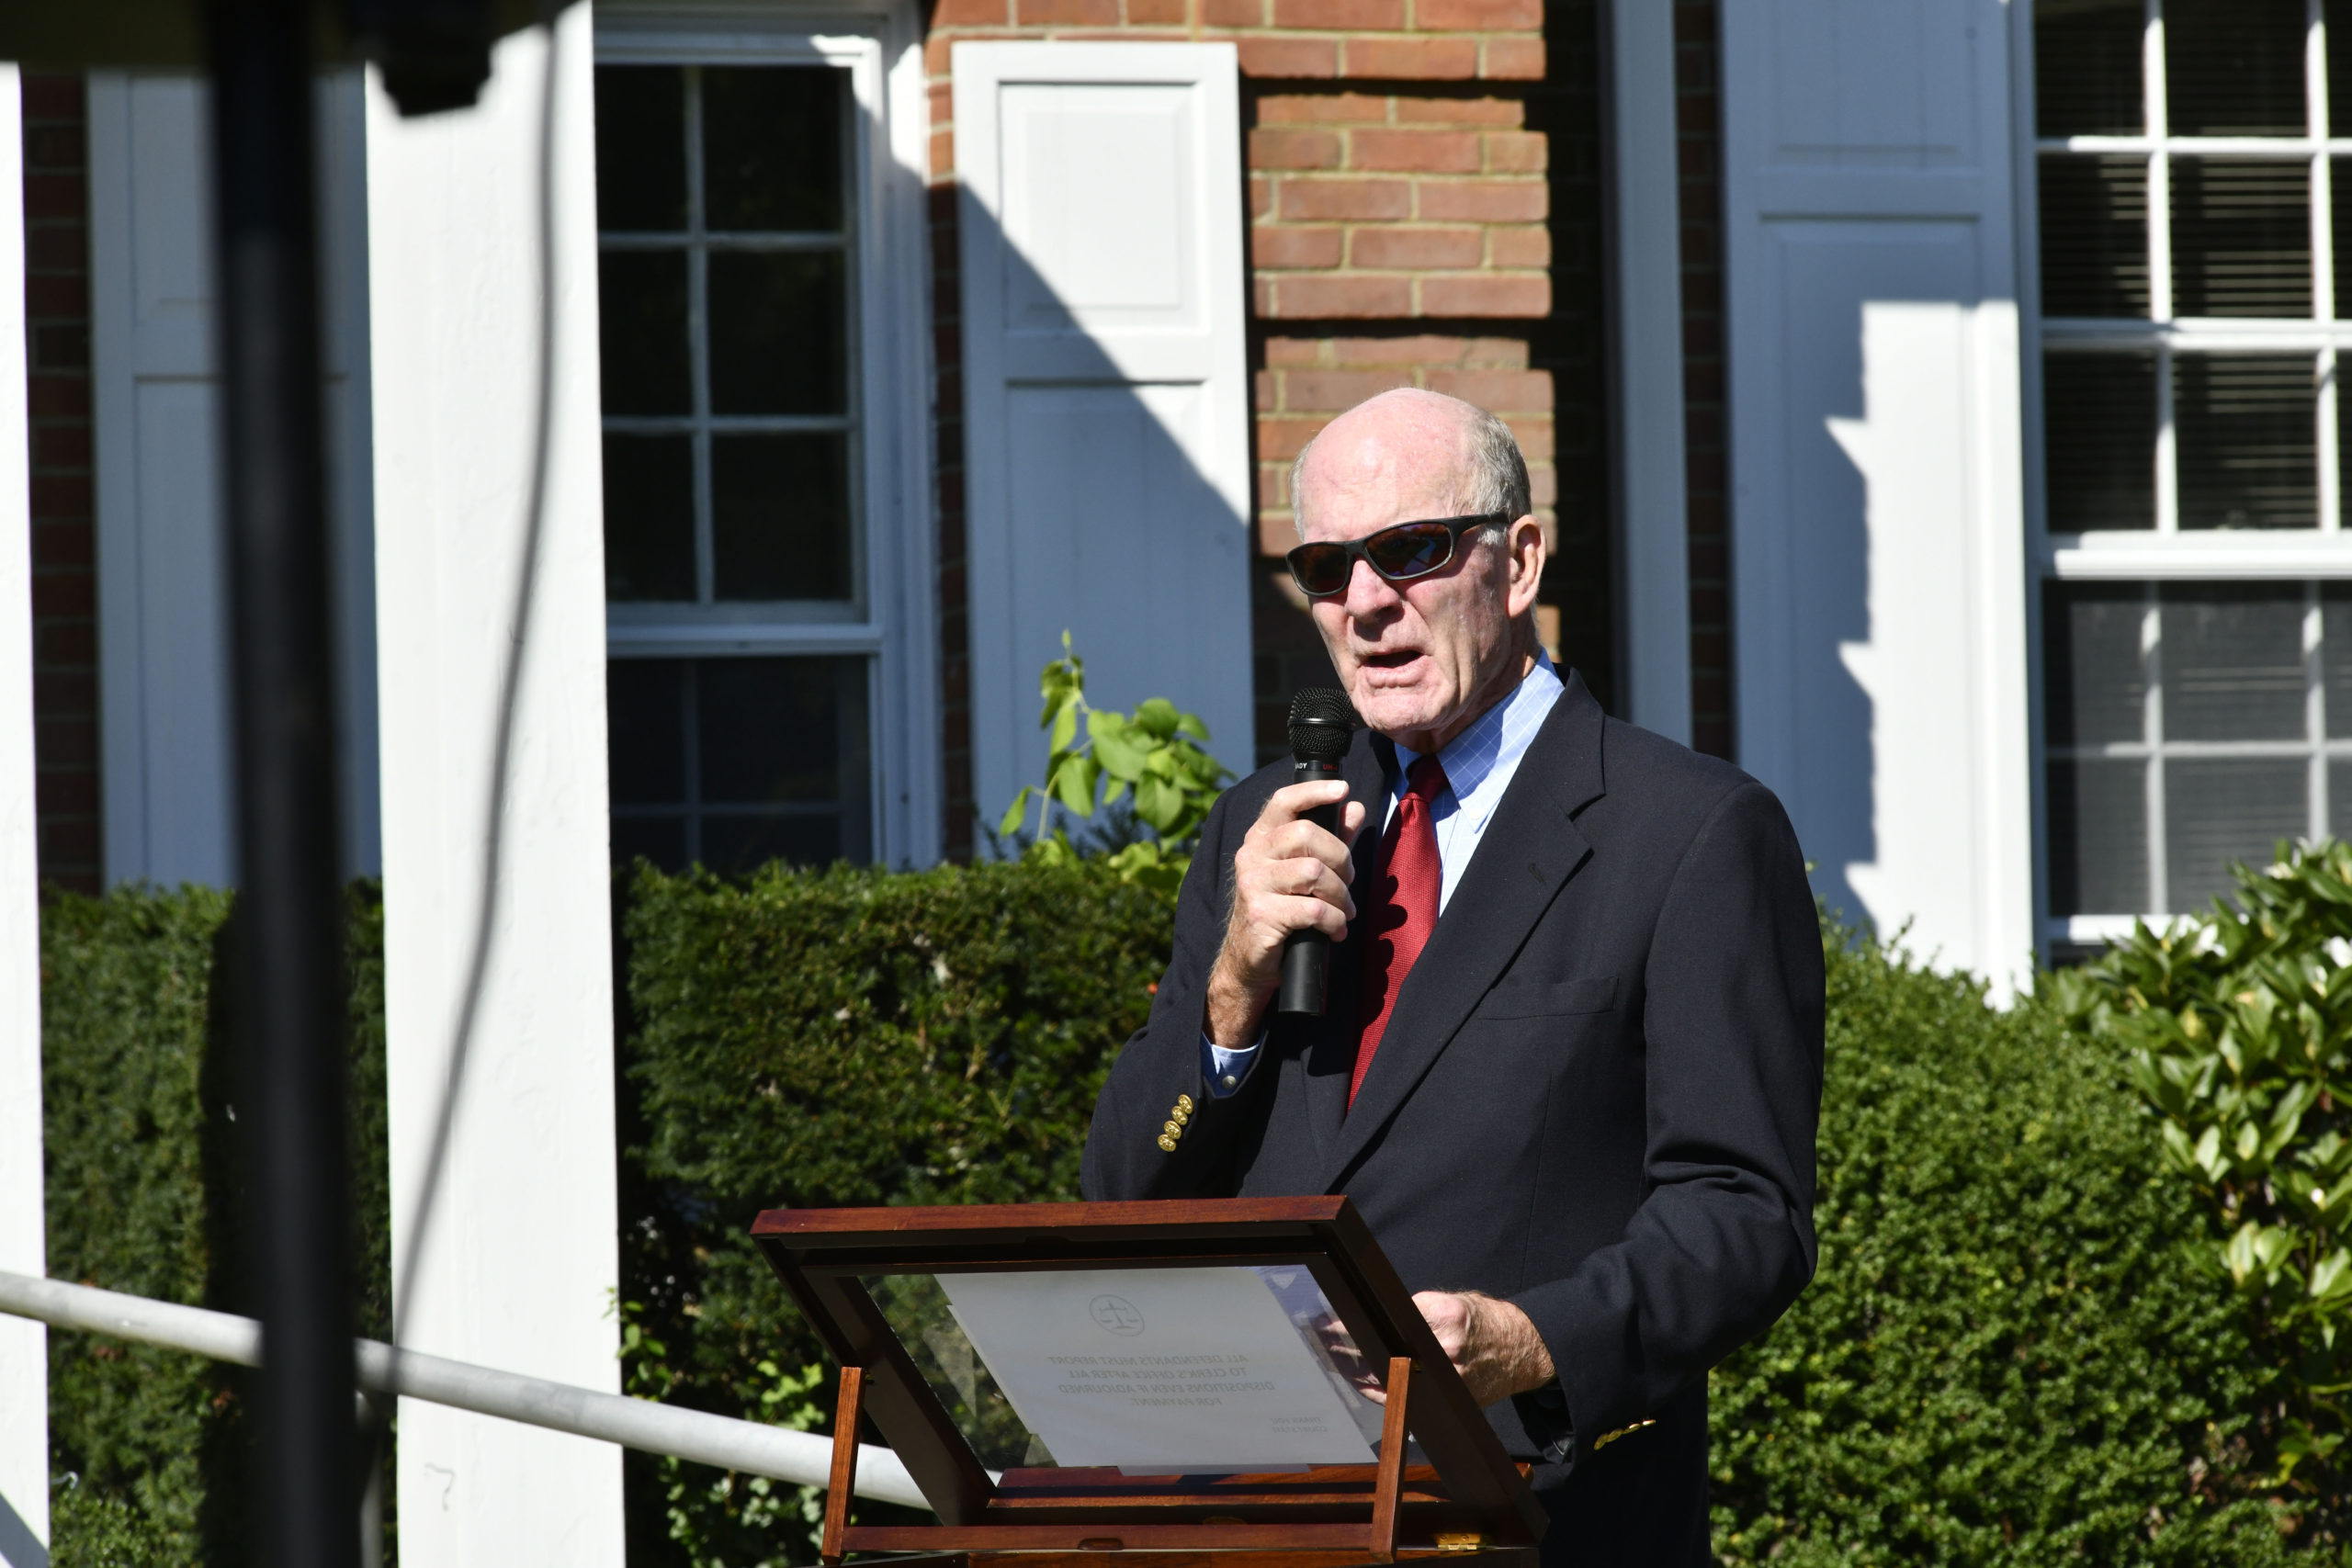 Quogue Village Mayor Peter Sartorius at the memorial rededication ceremony on Saturday.